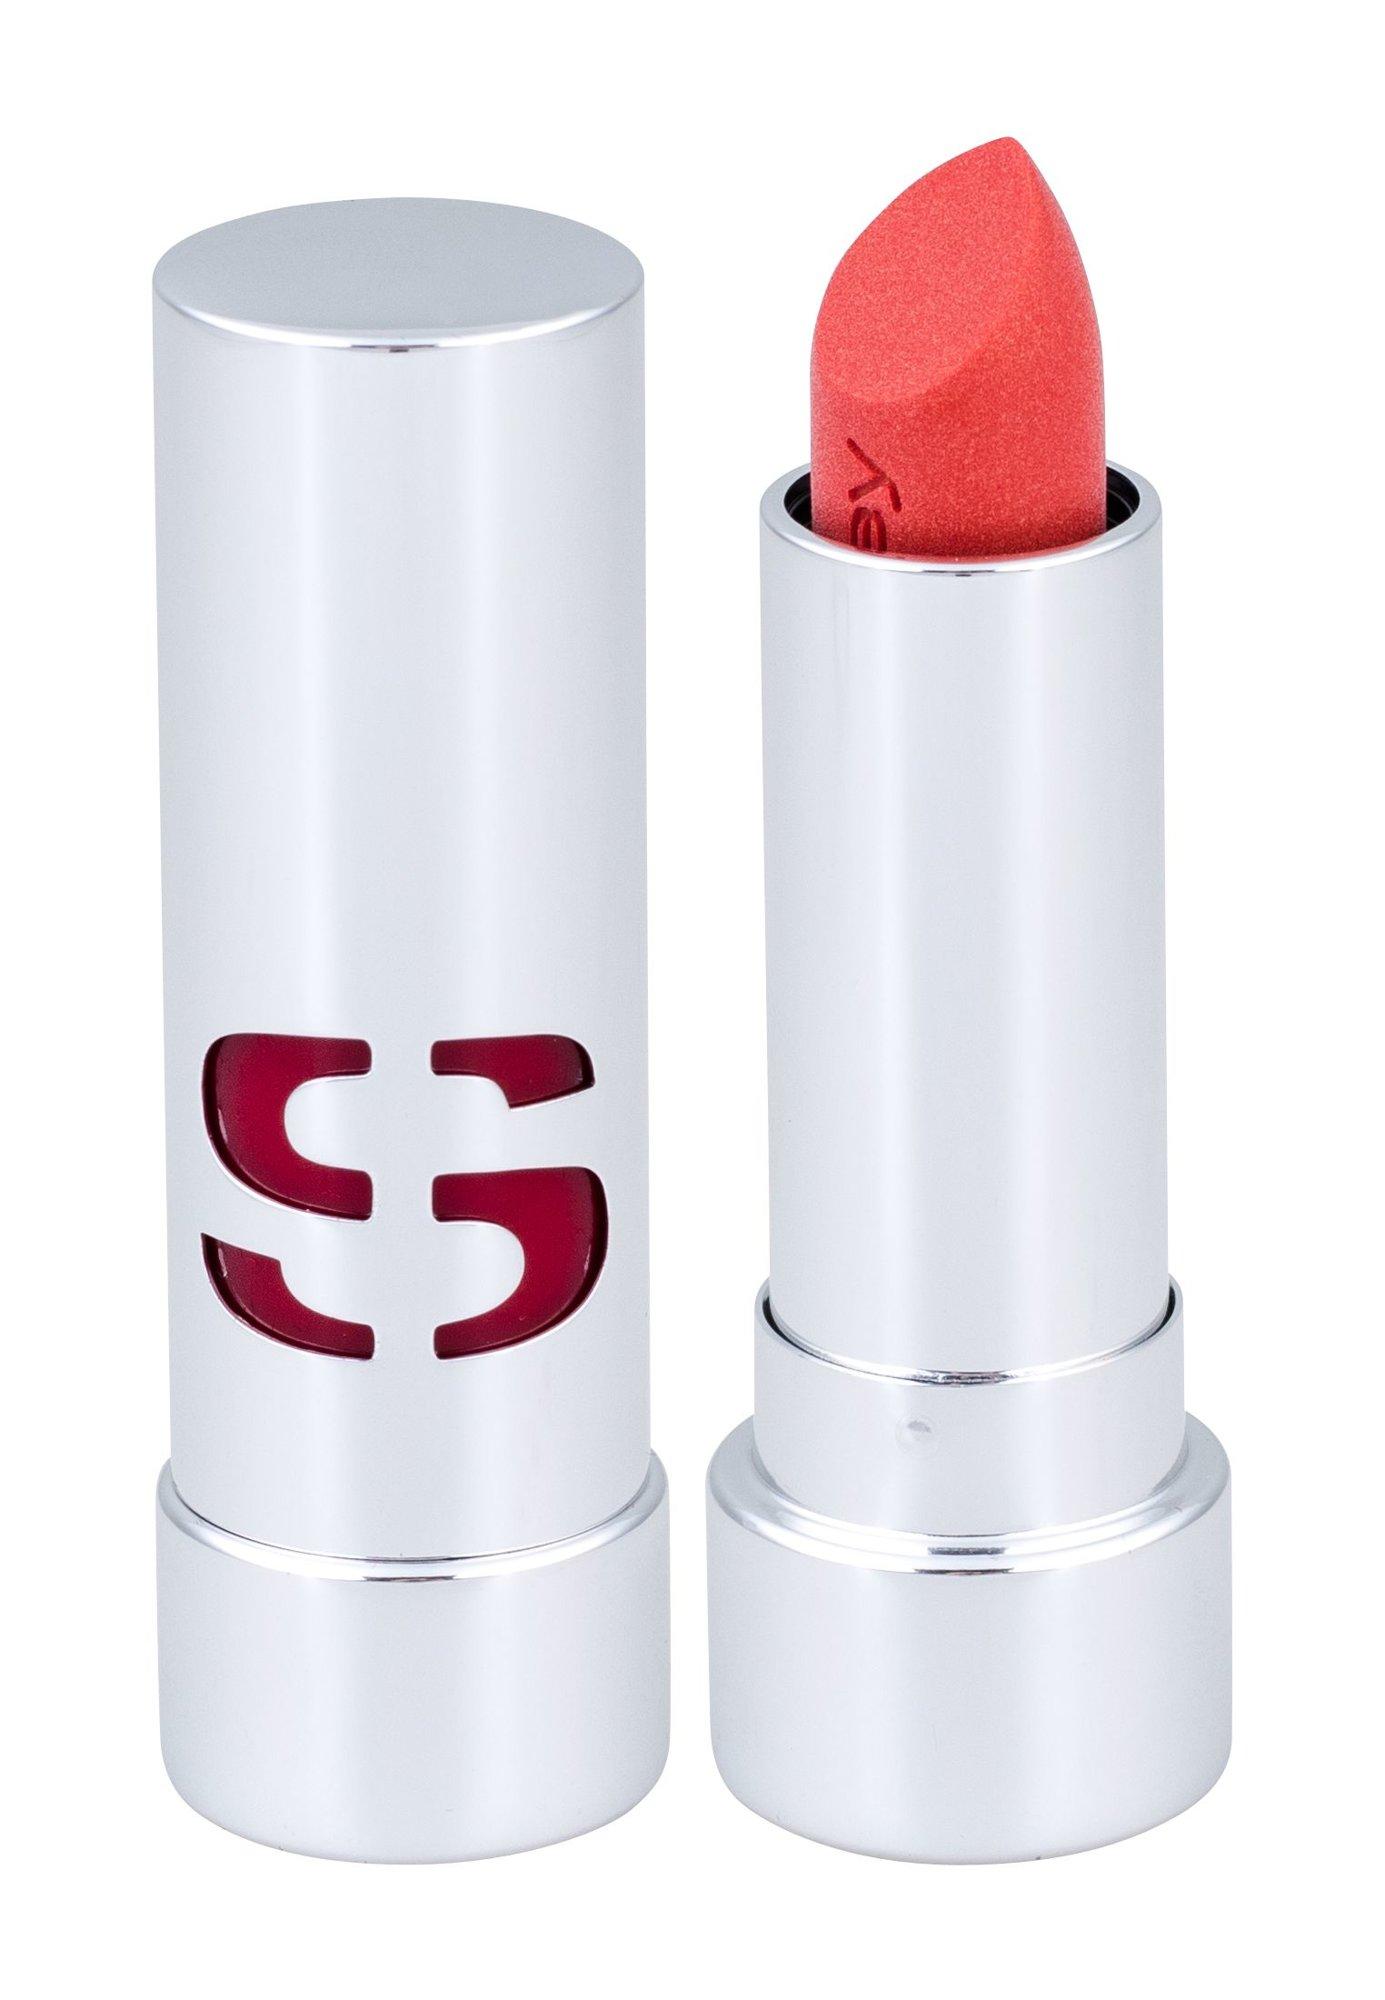 Sisley Phyto Lip Shine Cosmetic 3ml 08 Sheer Coral